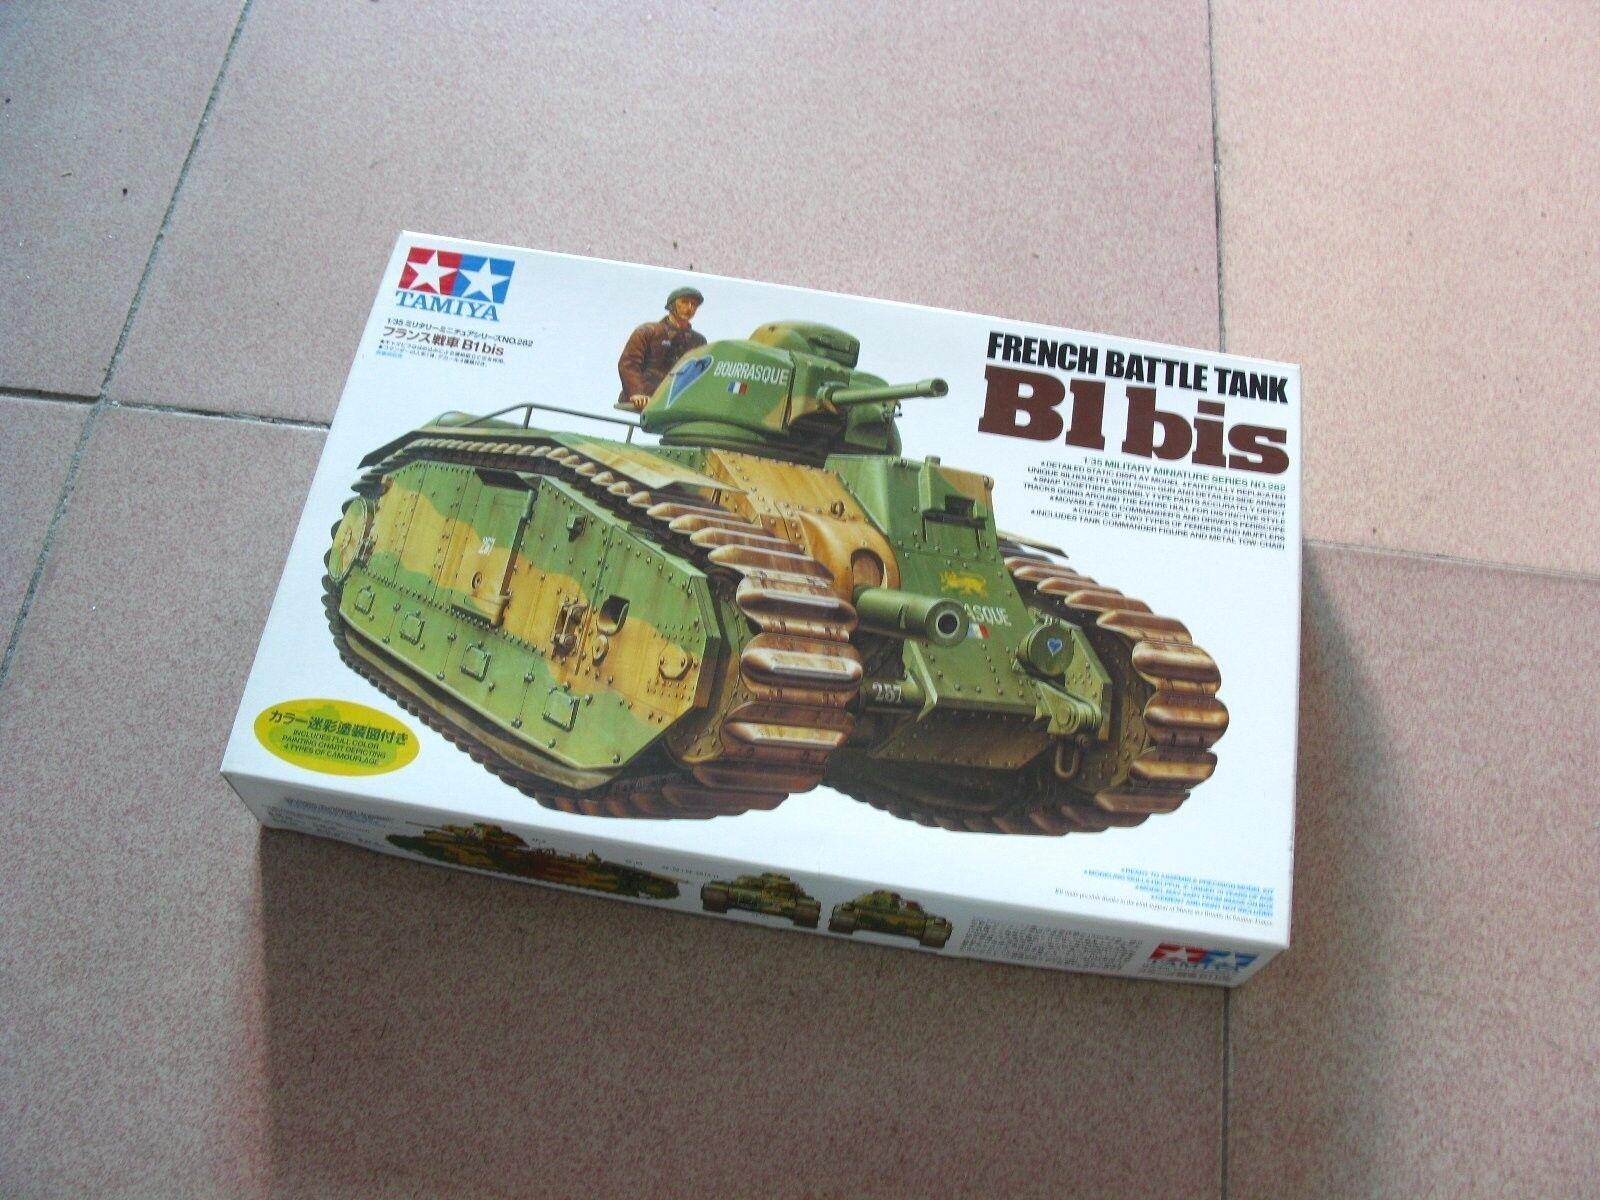 Tamiya 1 35 French Battle Tank Char B1 bis